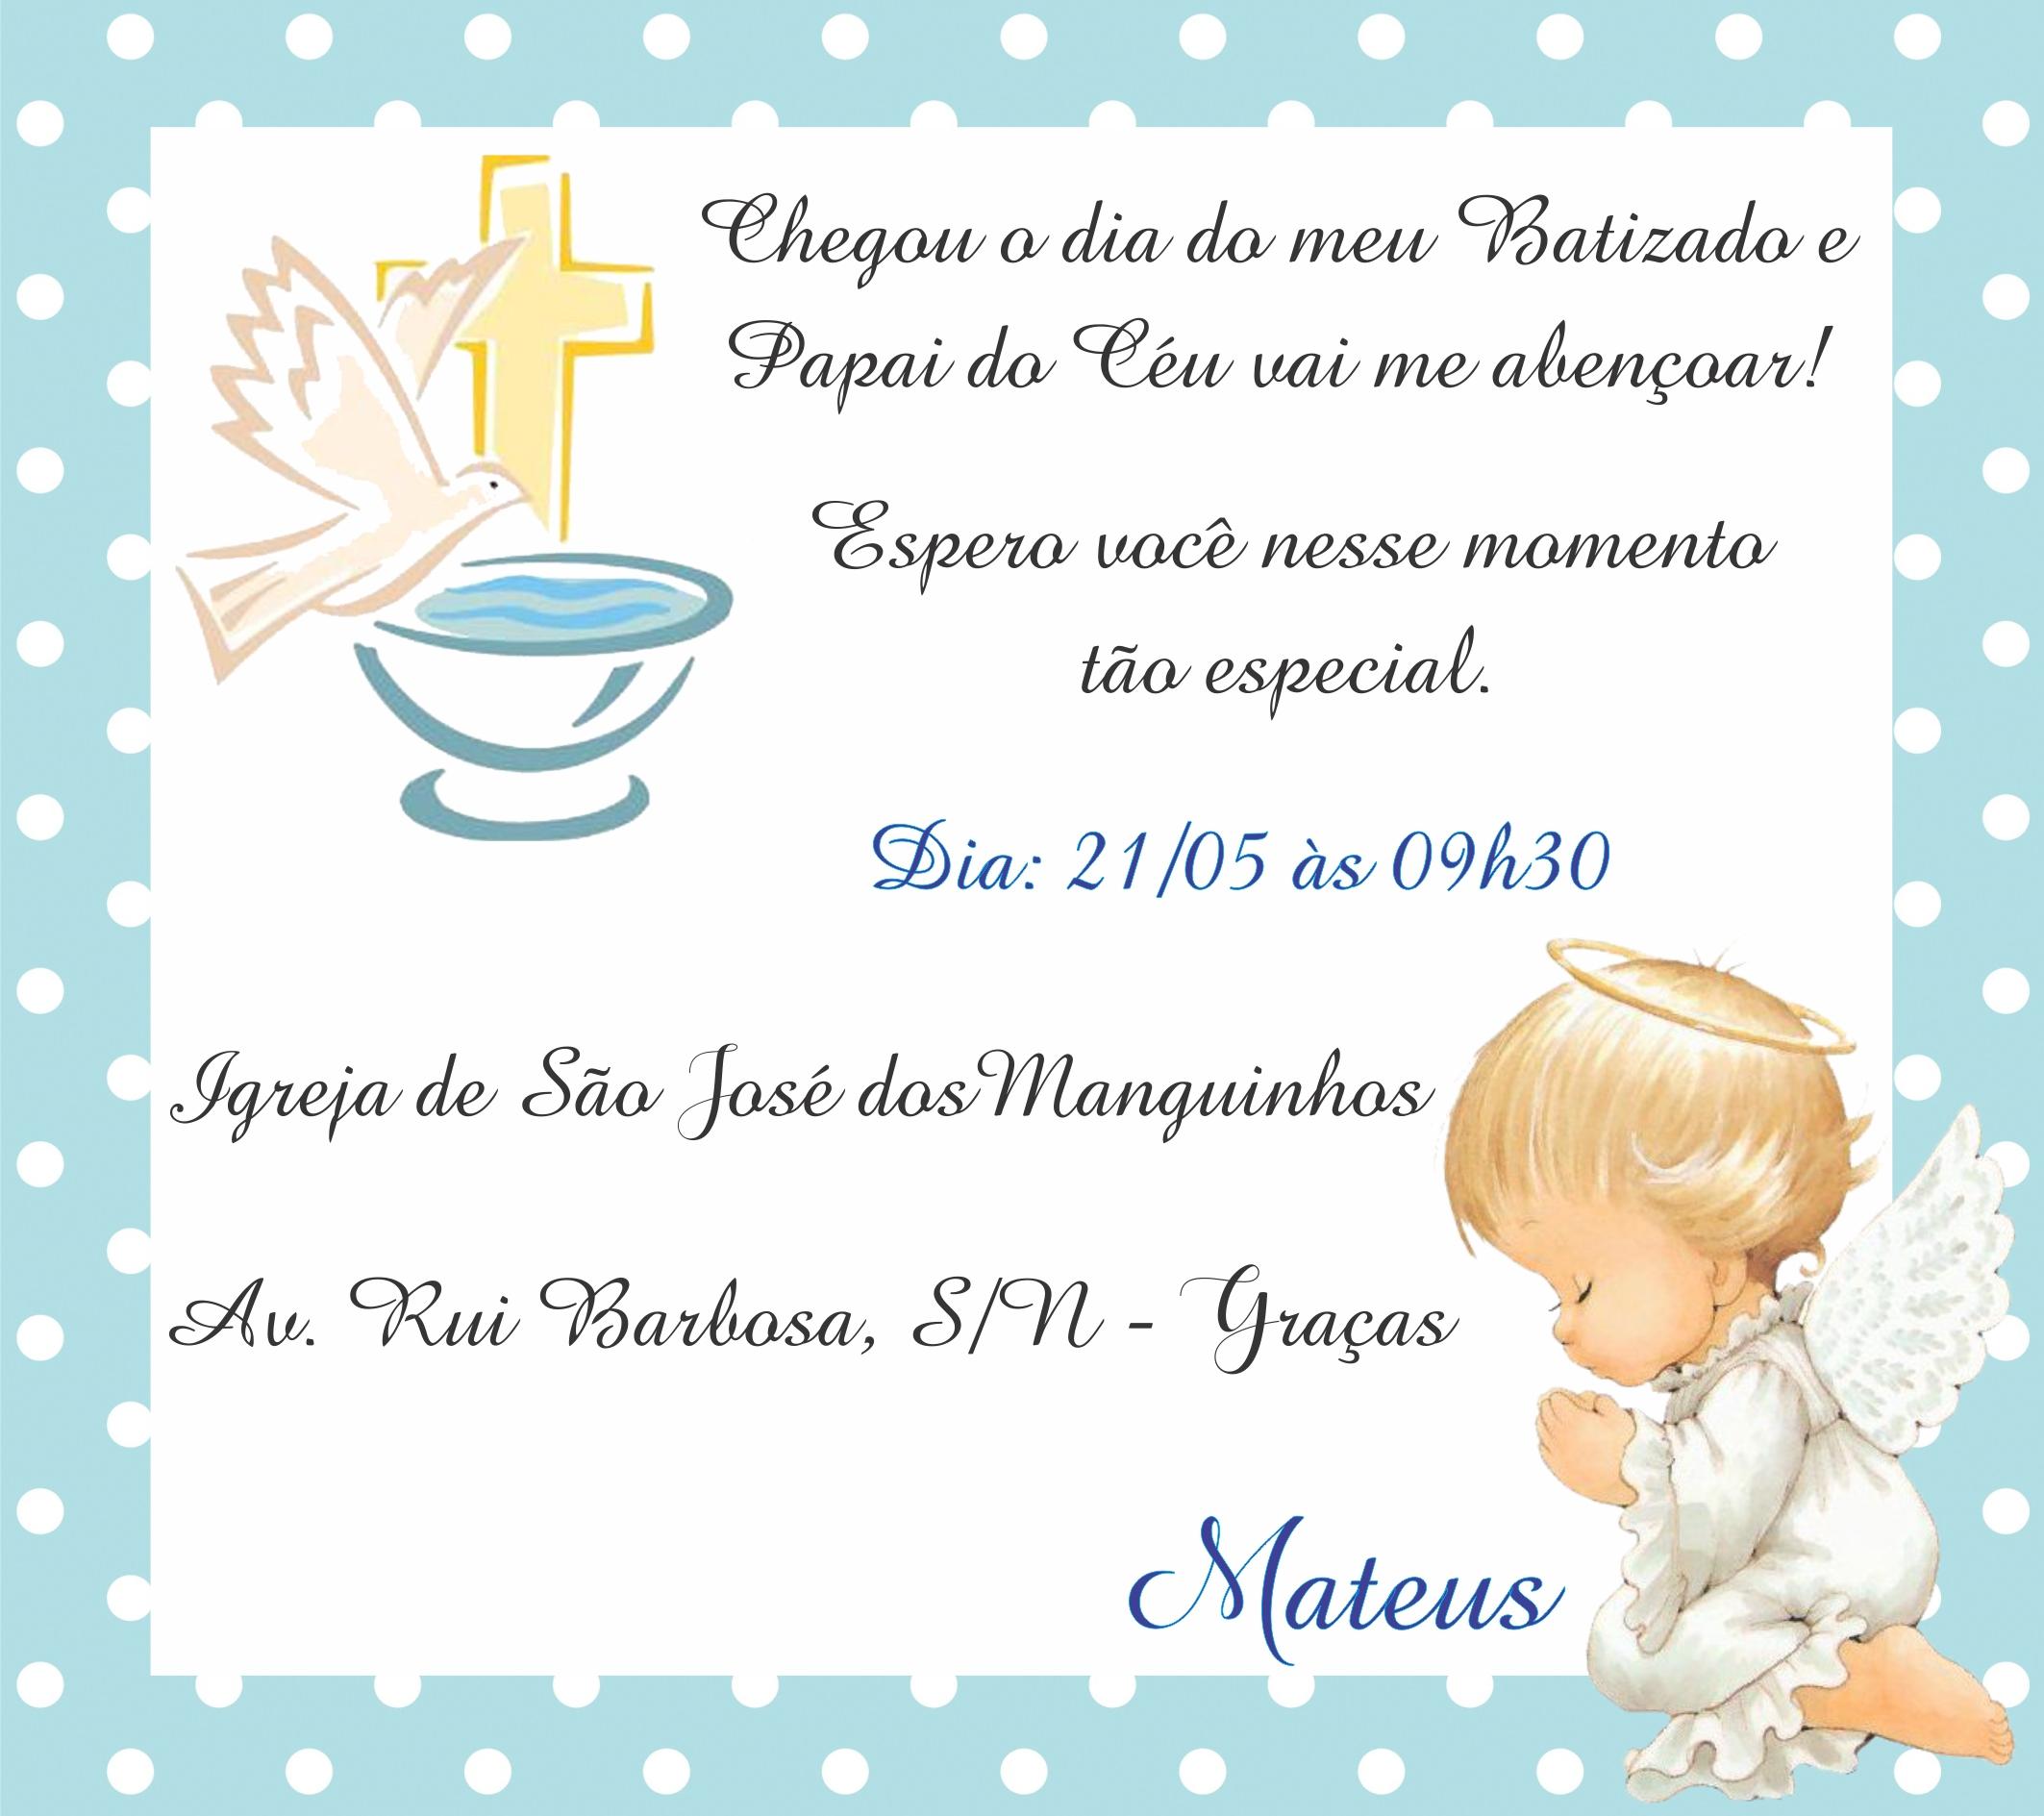 Convite digital batizado anjinho azul no elo7 marcante artes 947ea6 altavistaventures Gallery